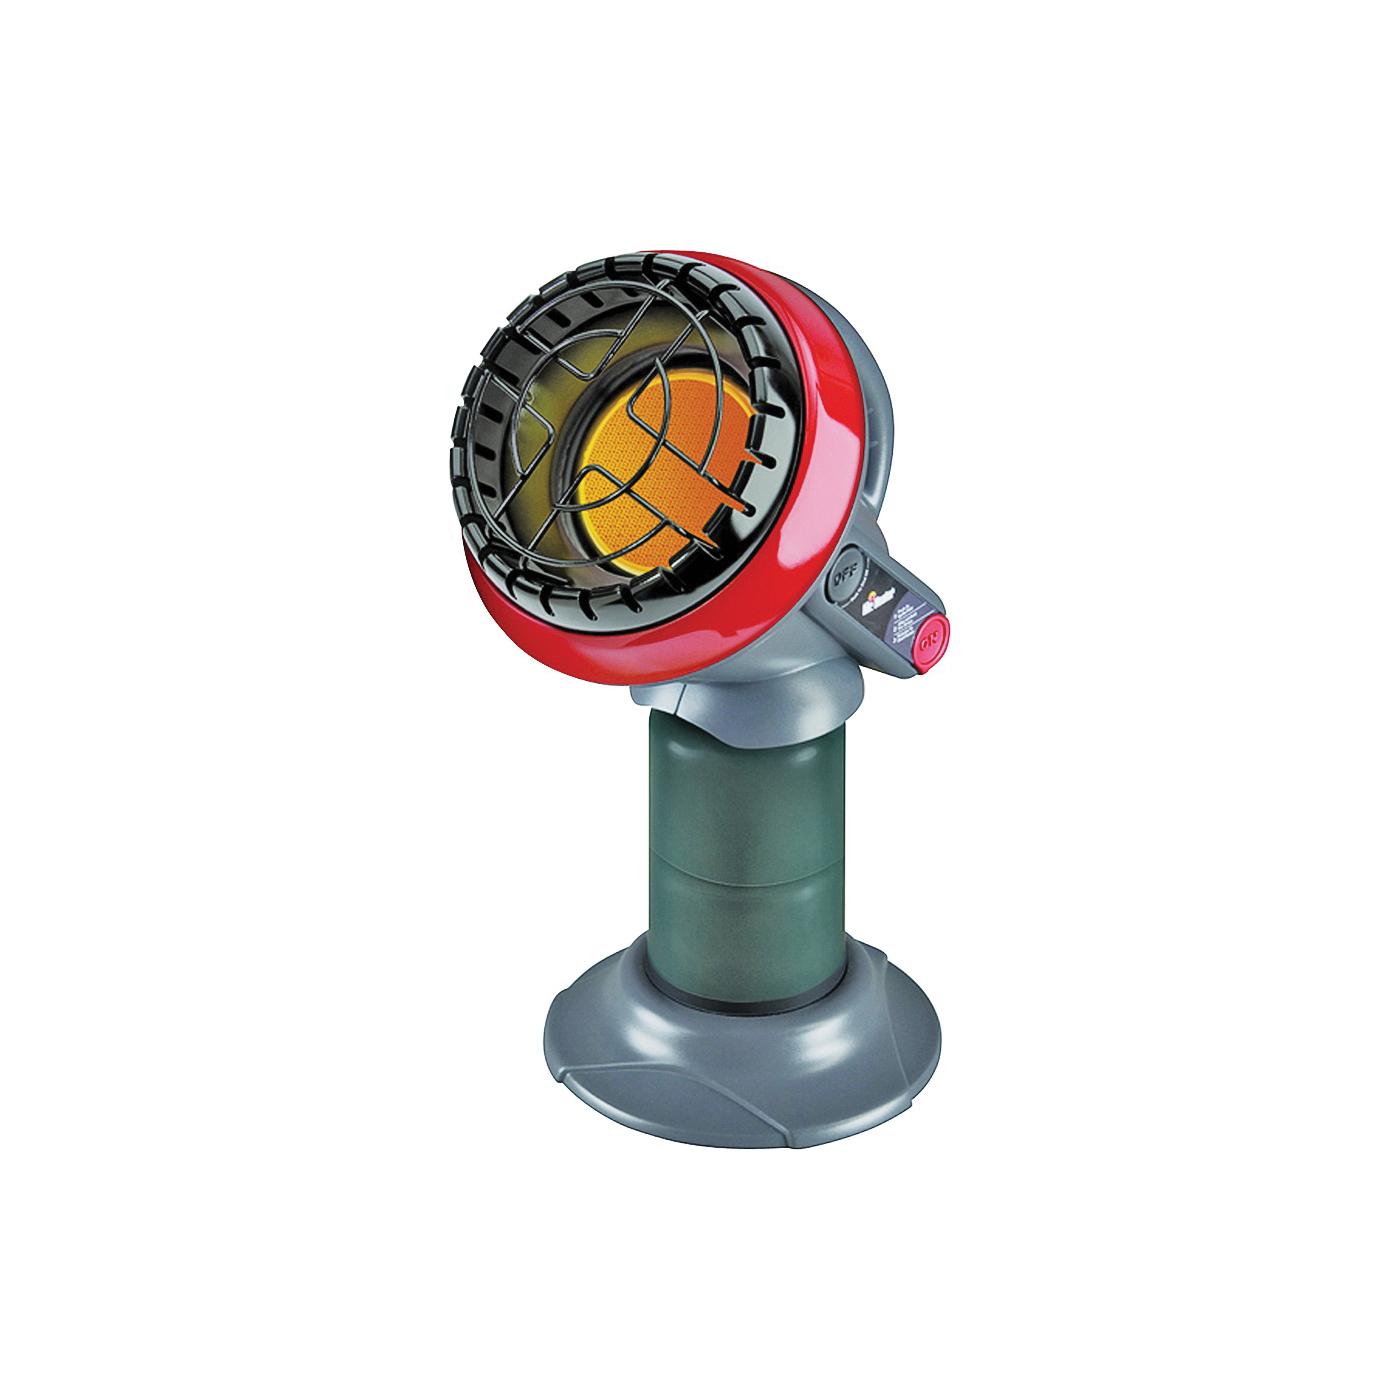 Picture of Mr. Heater F215120 Portale Little Buddy Heater, 1 lb Fuel Tank, Propane, 3800 Btu, 95 sq-ft Heating Area